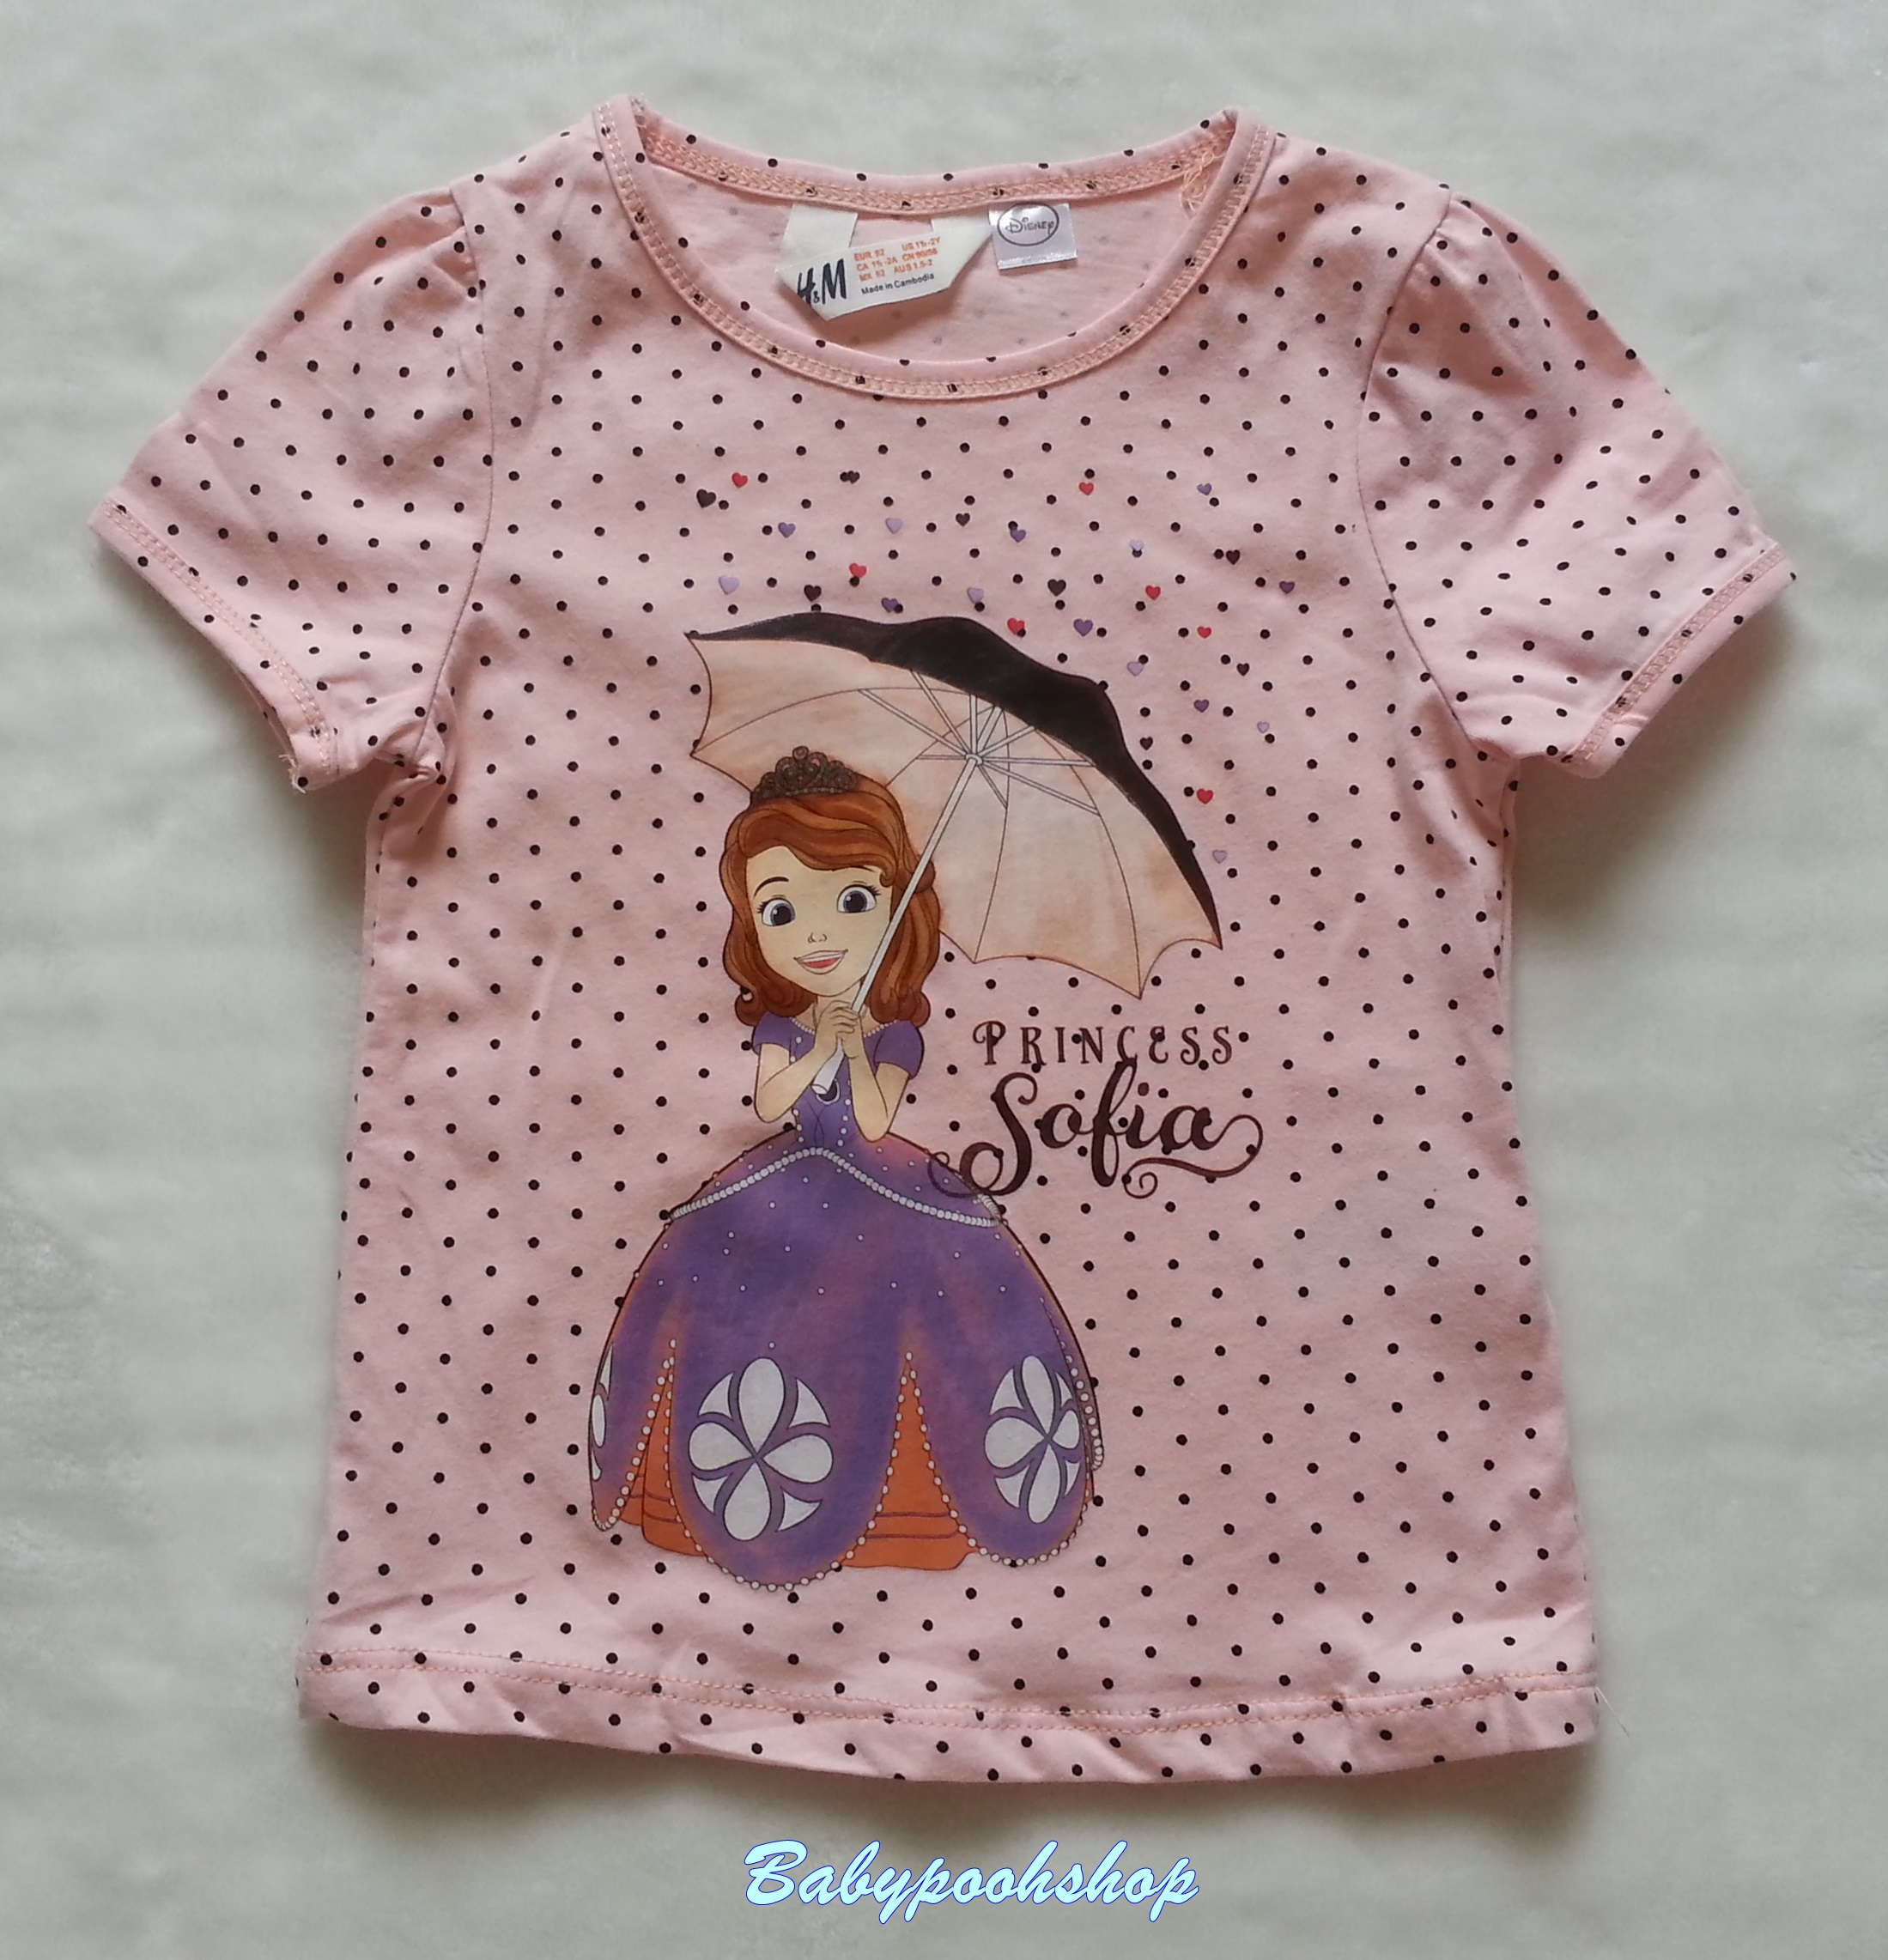 H&M : เสื้อยืด สกรีนลาย เจ้าหญิง โซเฟีย สีโอรส Size : 12-14y